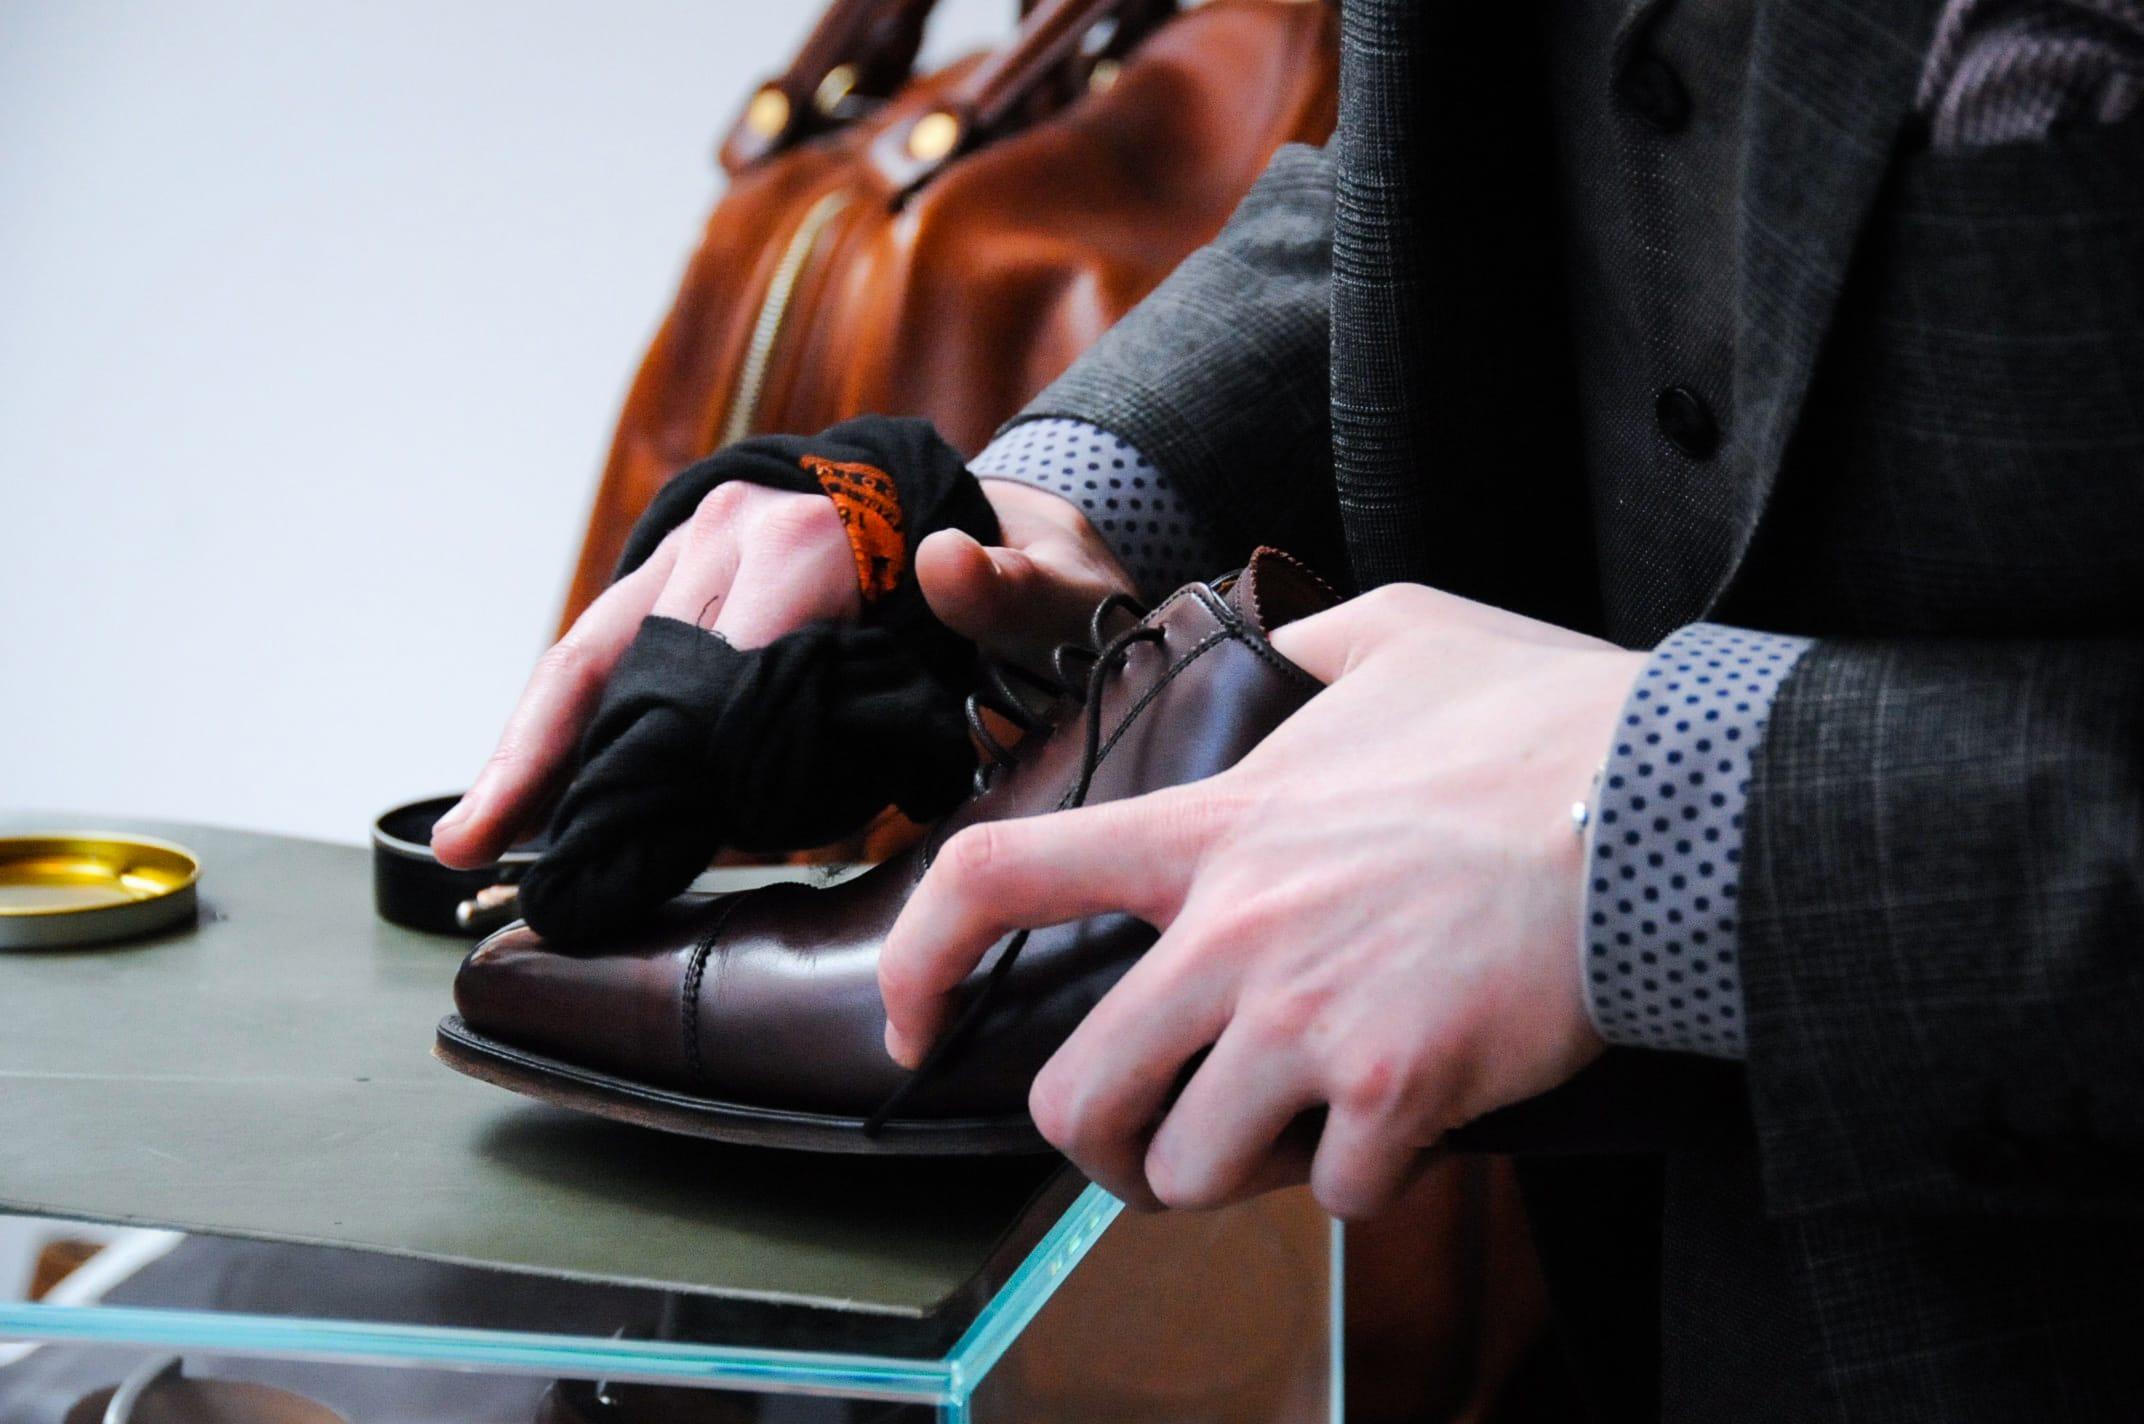 Shoe Polishing: A Step-By-Step Guide